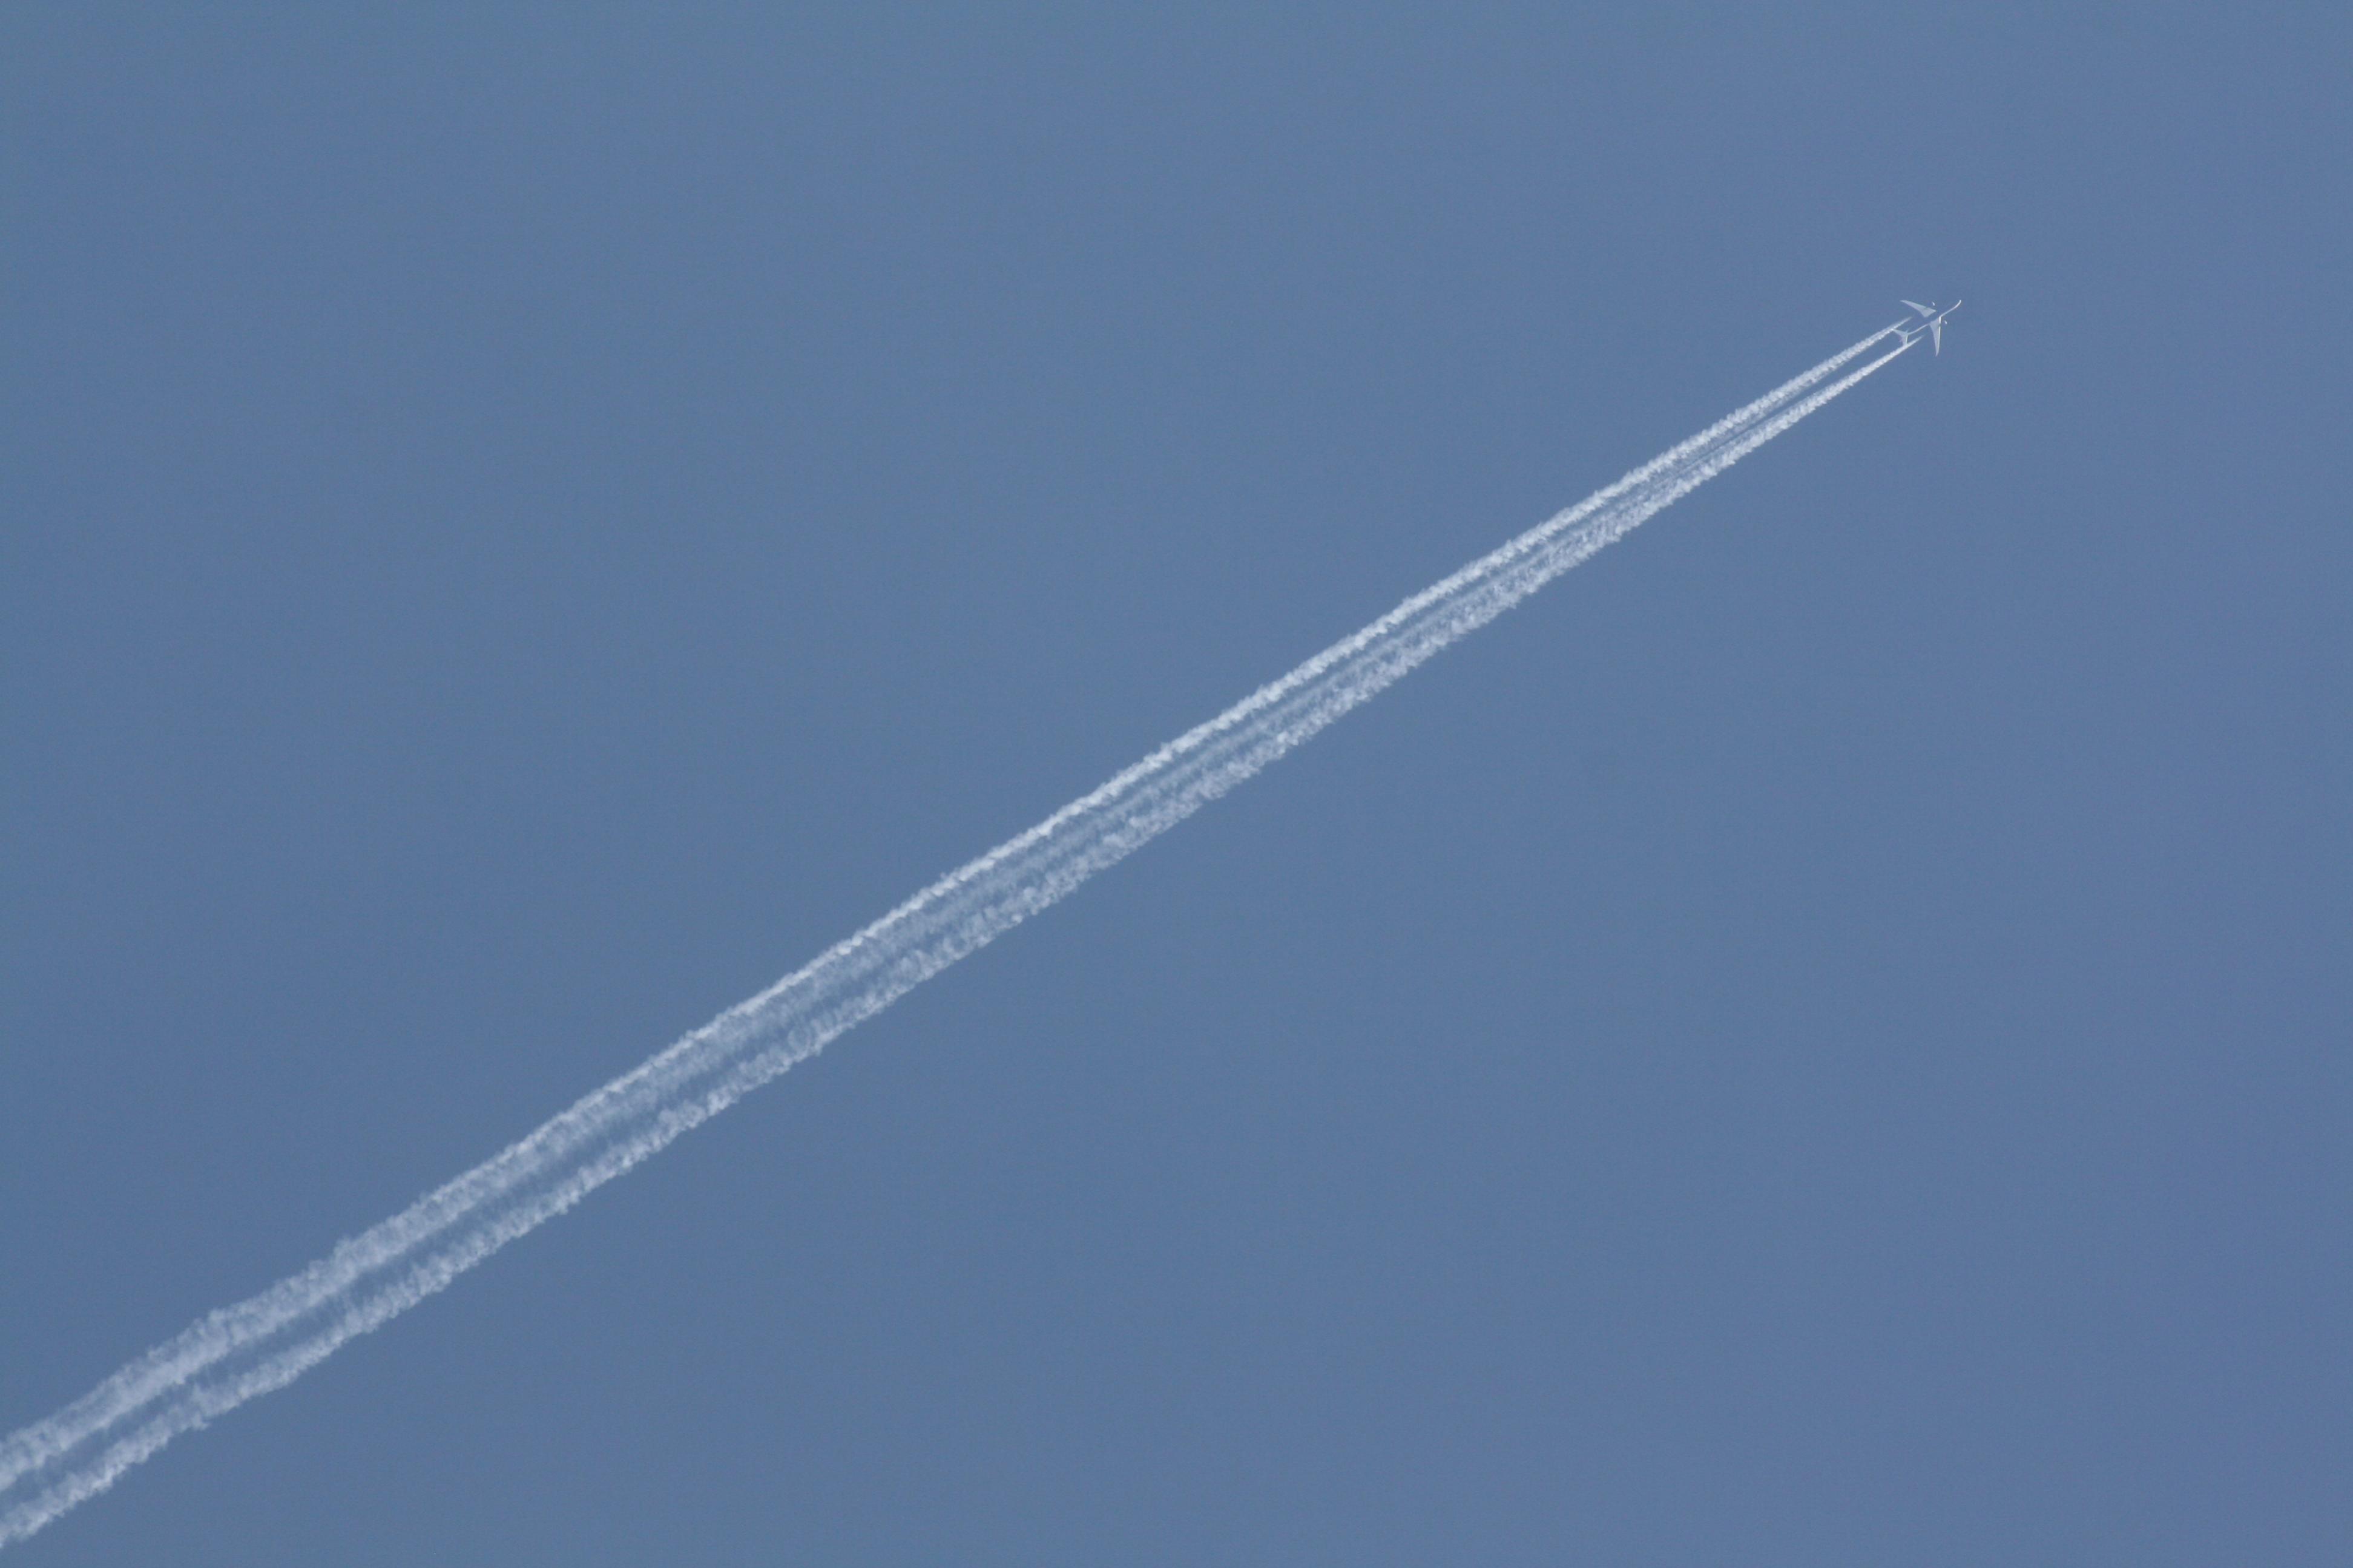 Naam: Boeing backgarden.jpg Bekeken: 338 Grootte: 391,7 KB